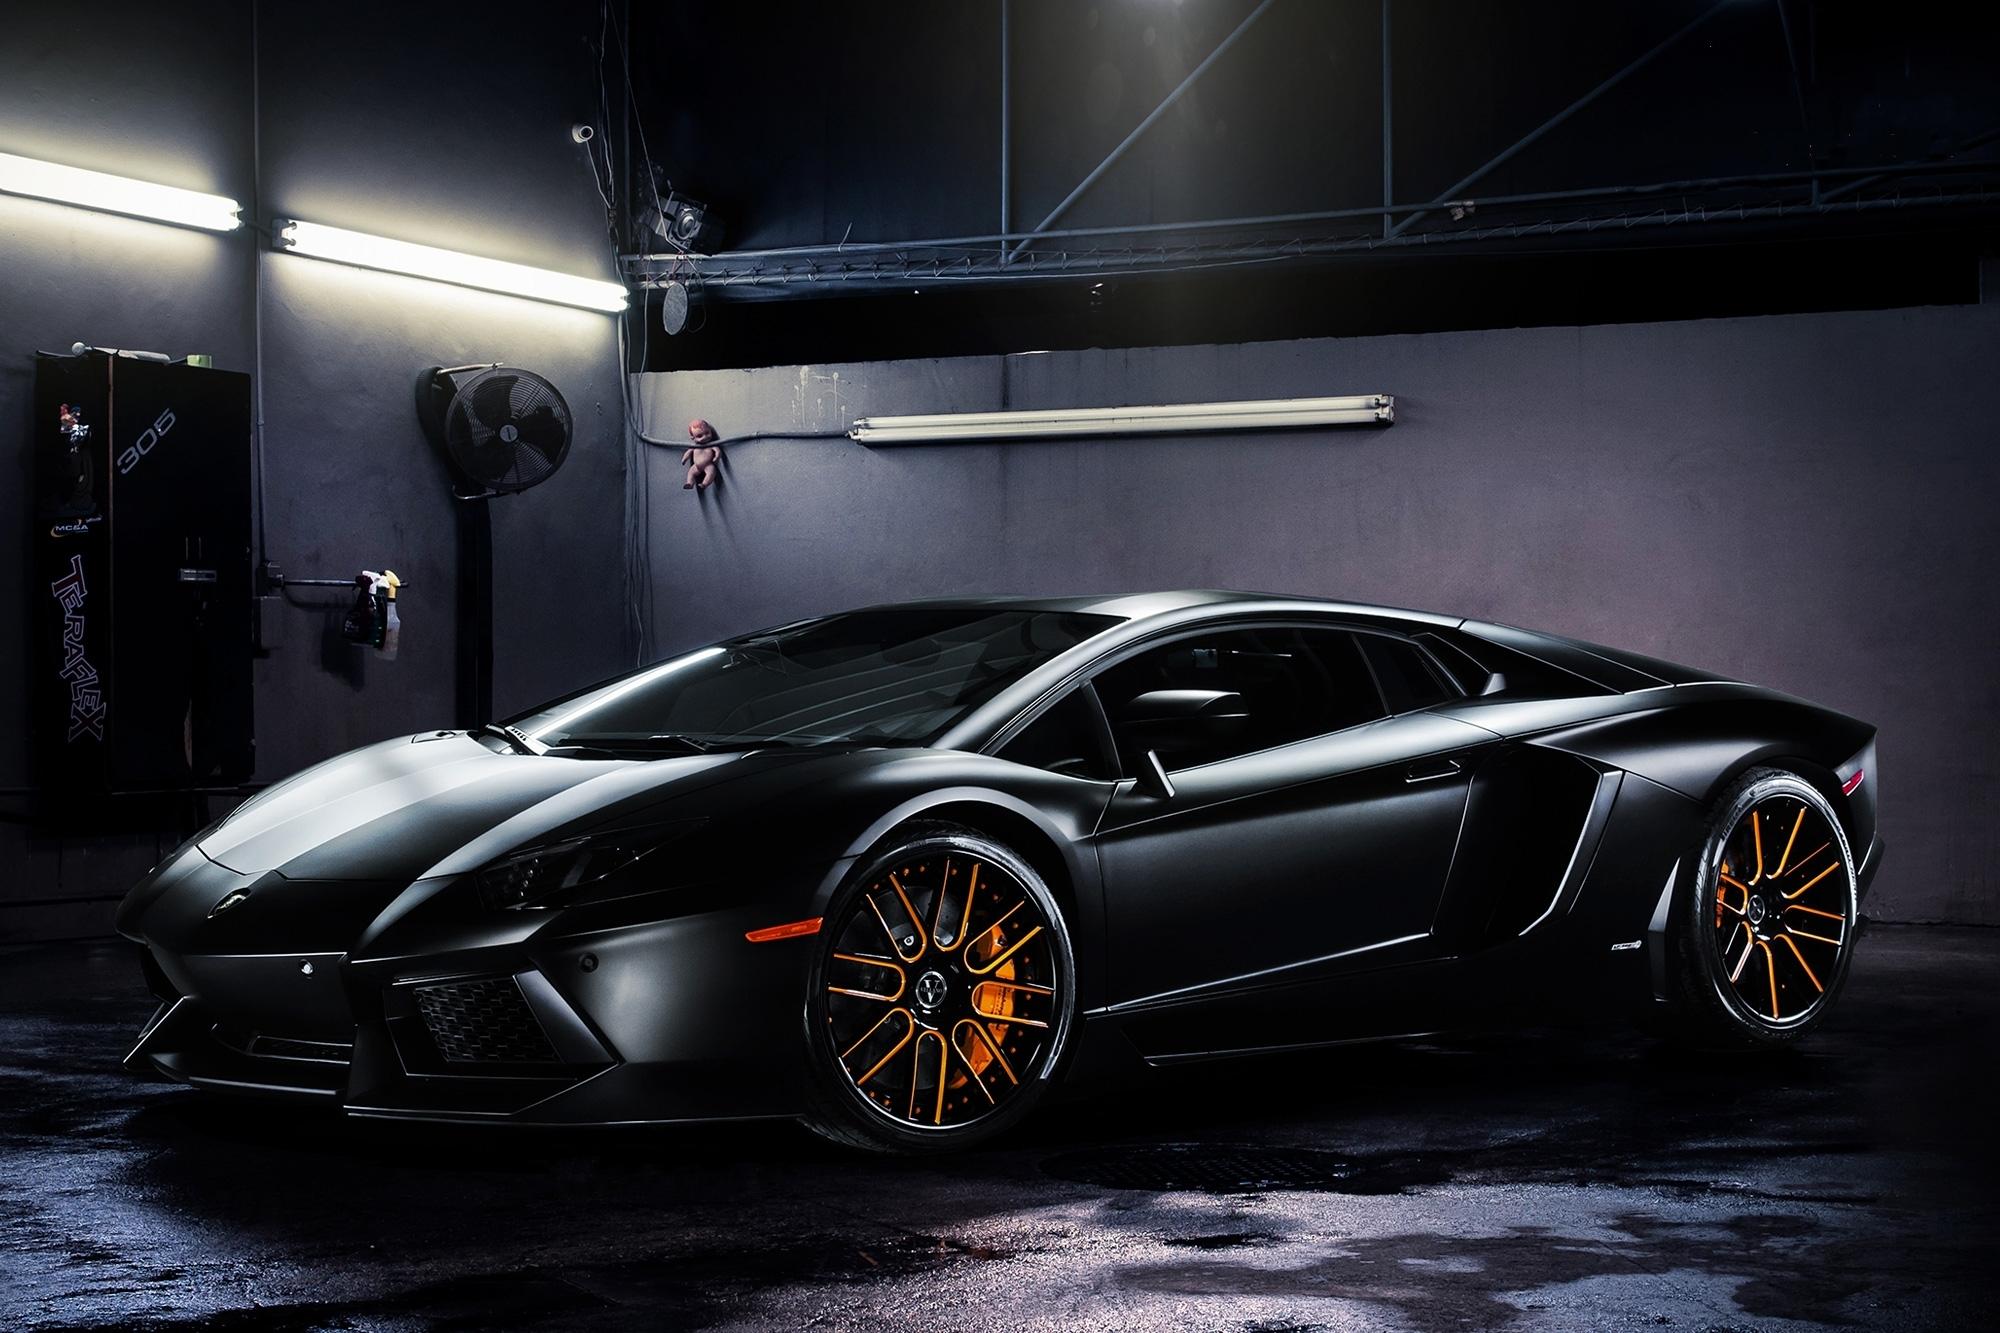 Tron Lamborghini Black Red Car Wallpapers Hd Desktop: Lamborghini Tapeta HD